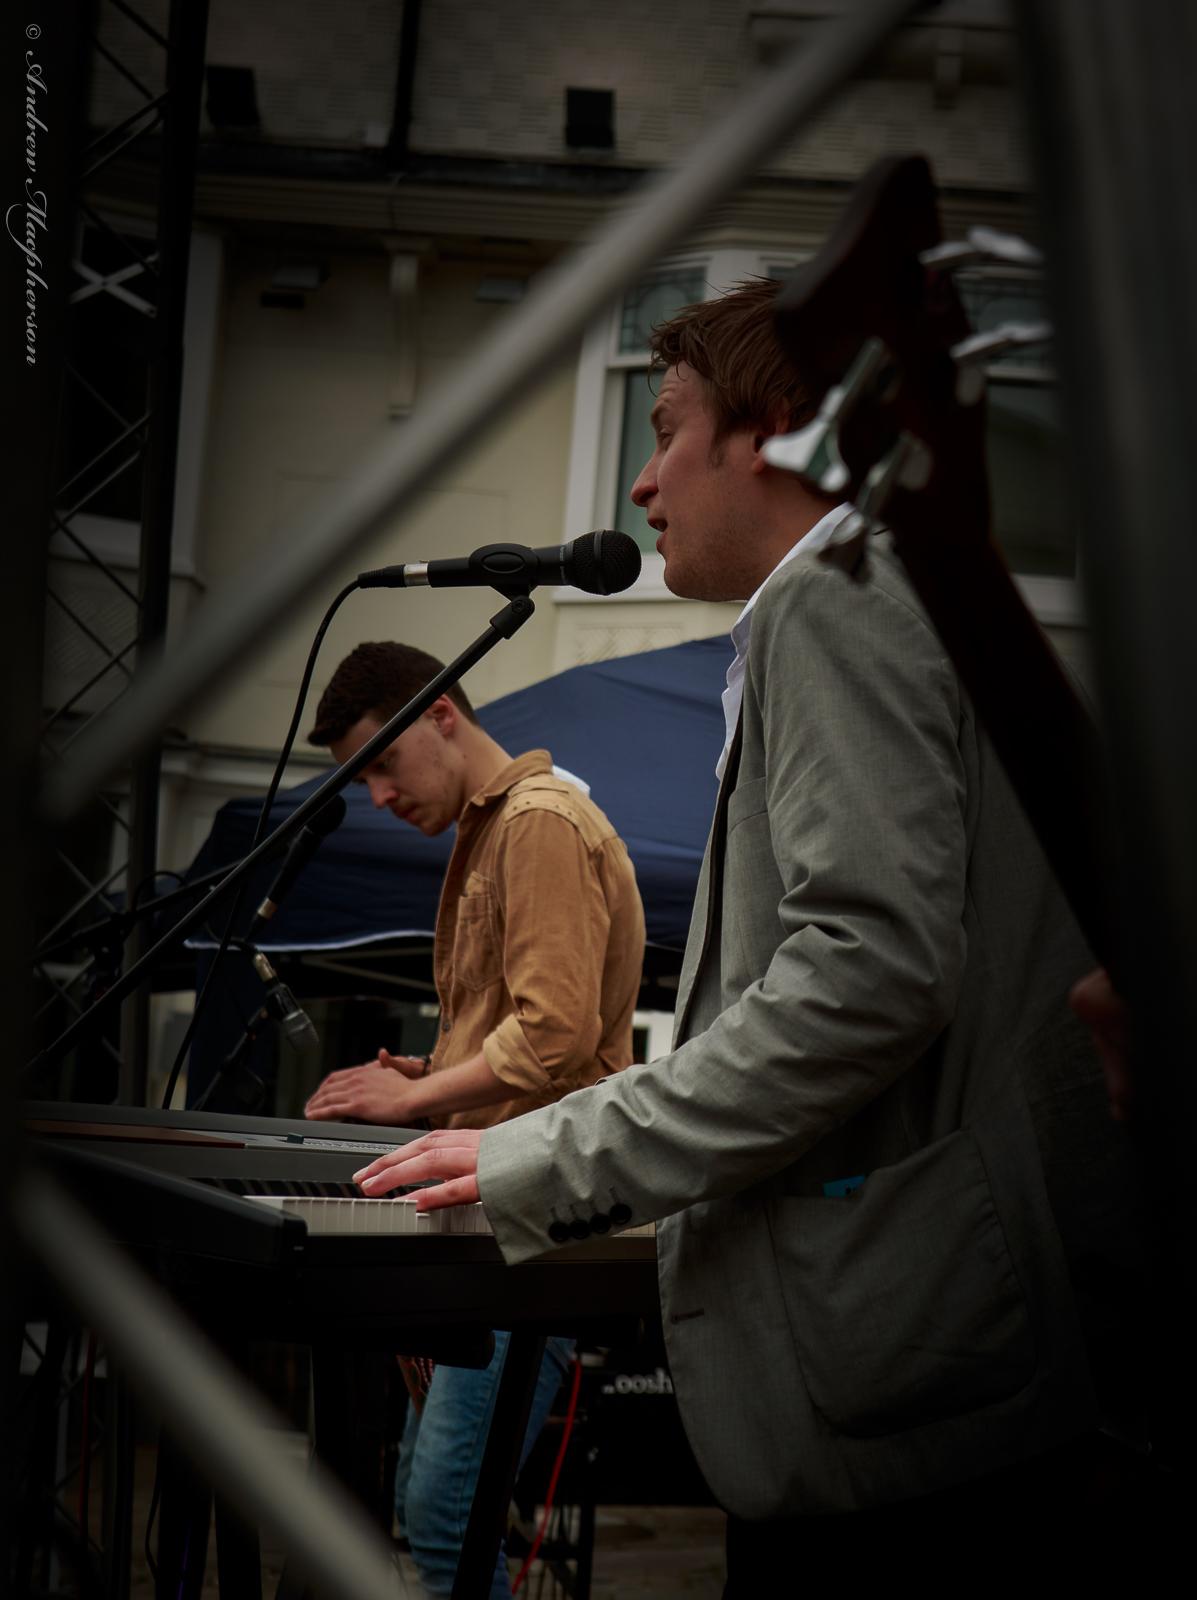 LBIS: Live Music